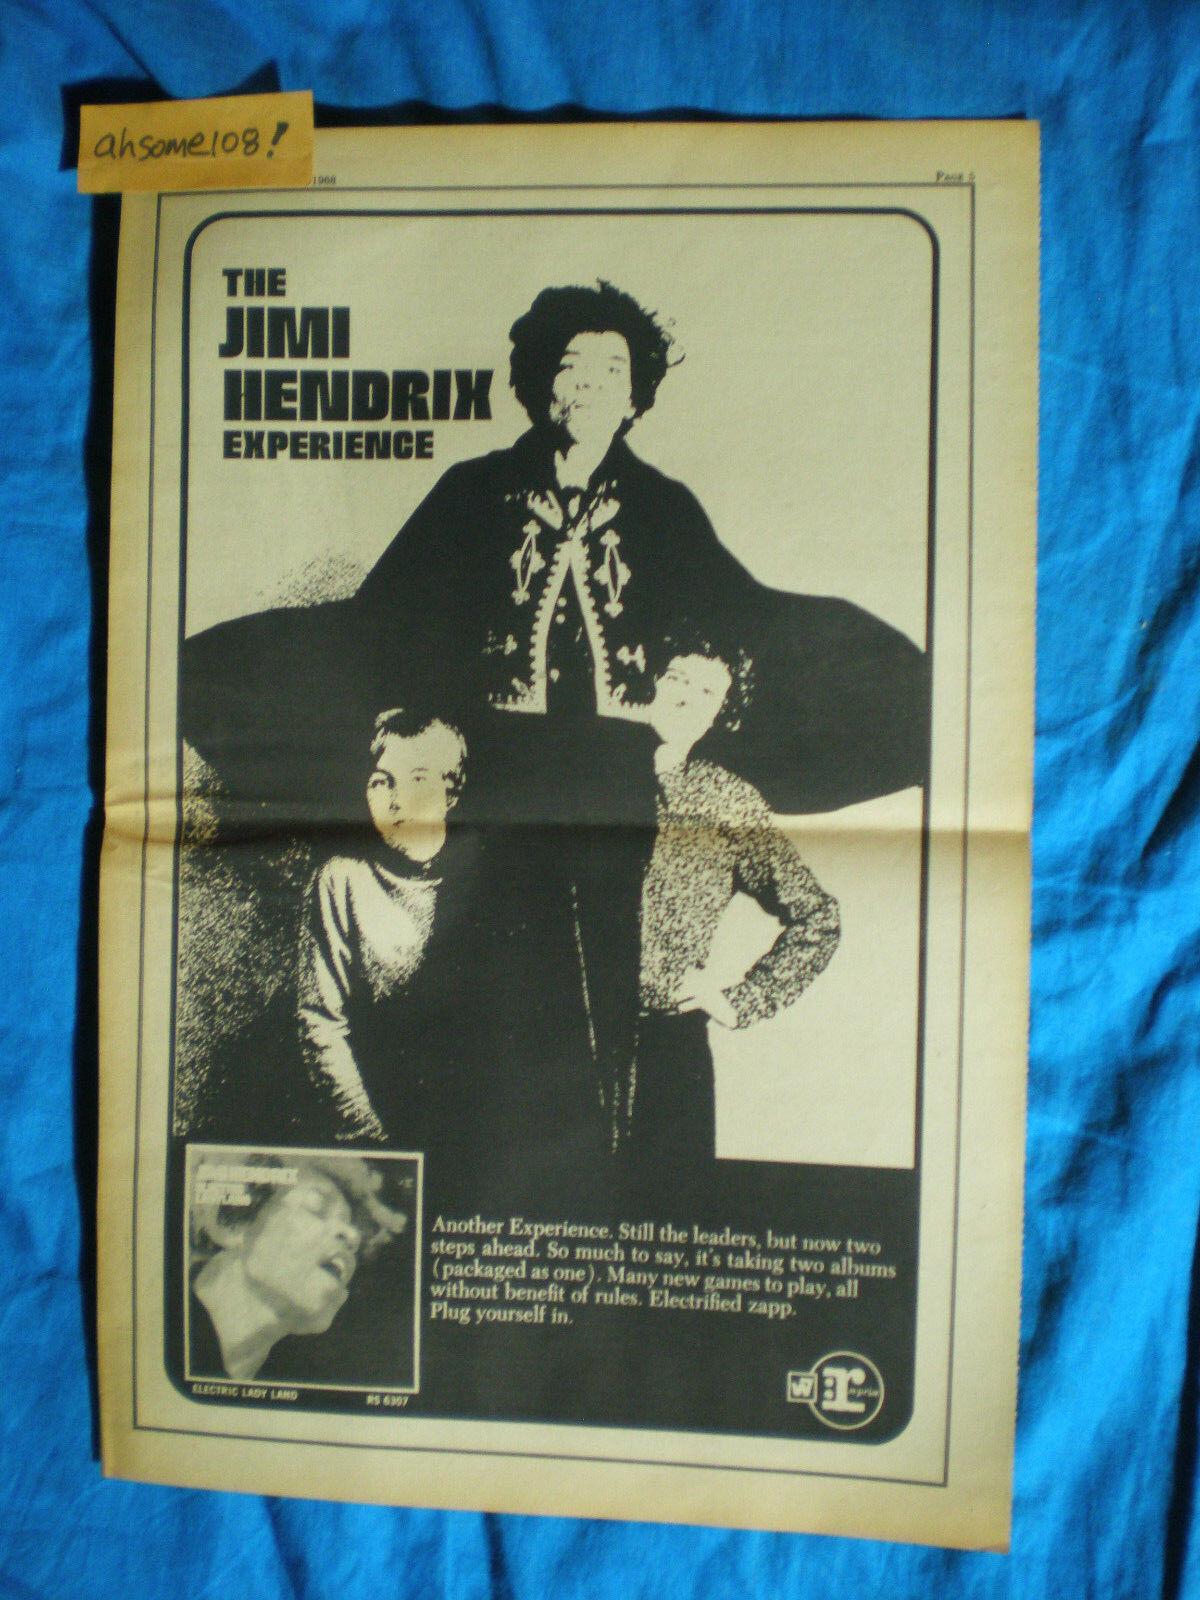 JIMI HENDRIX EXPERIENCE RARE Lg. 11X17 1968 Electric Lady LP Promo Ad POSTER - $79.69